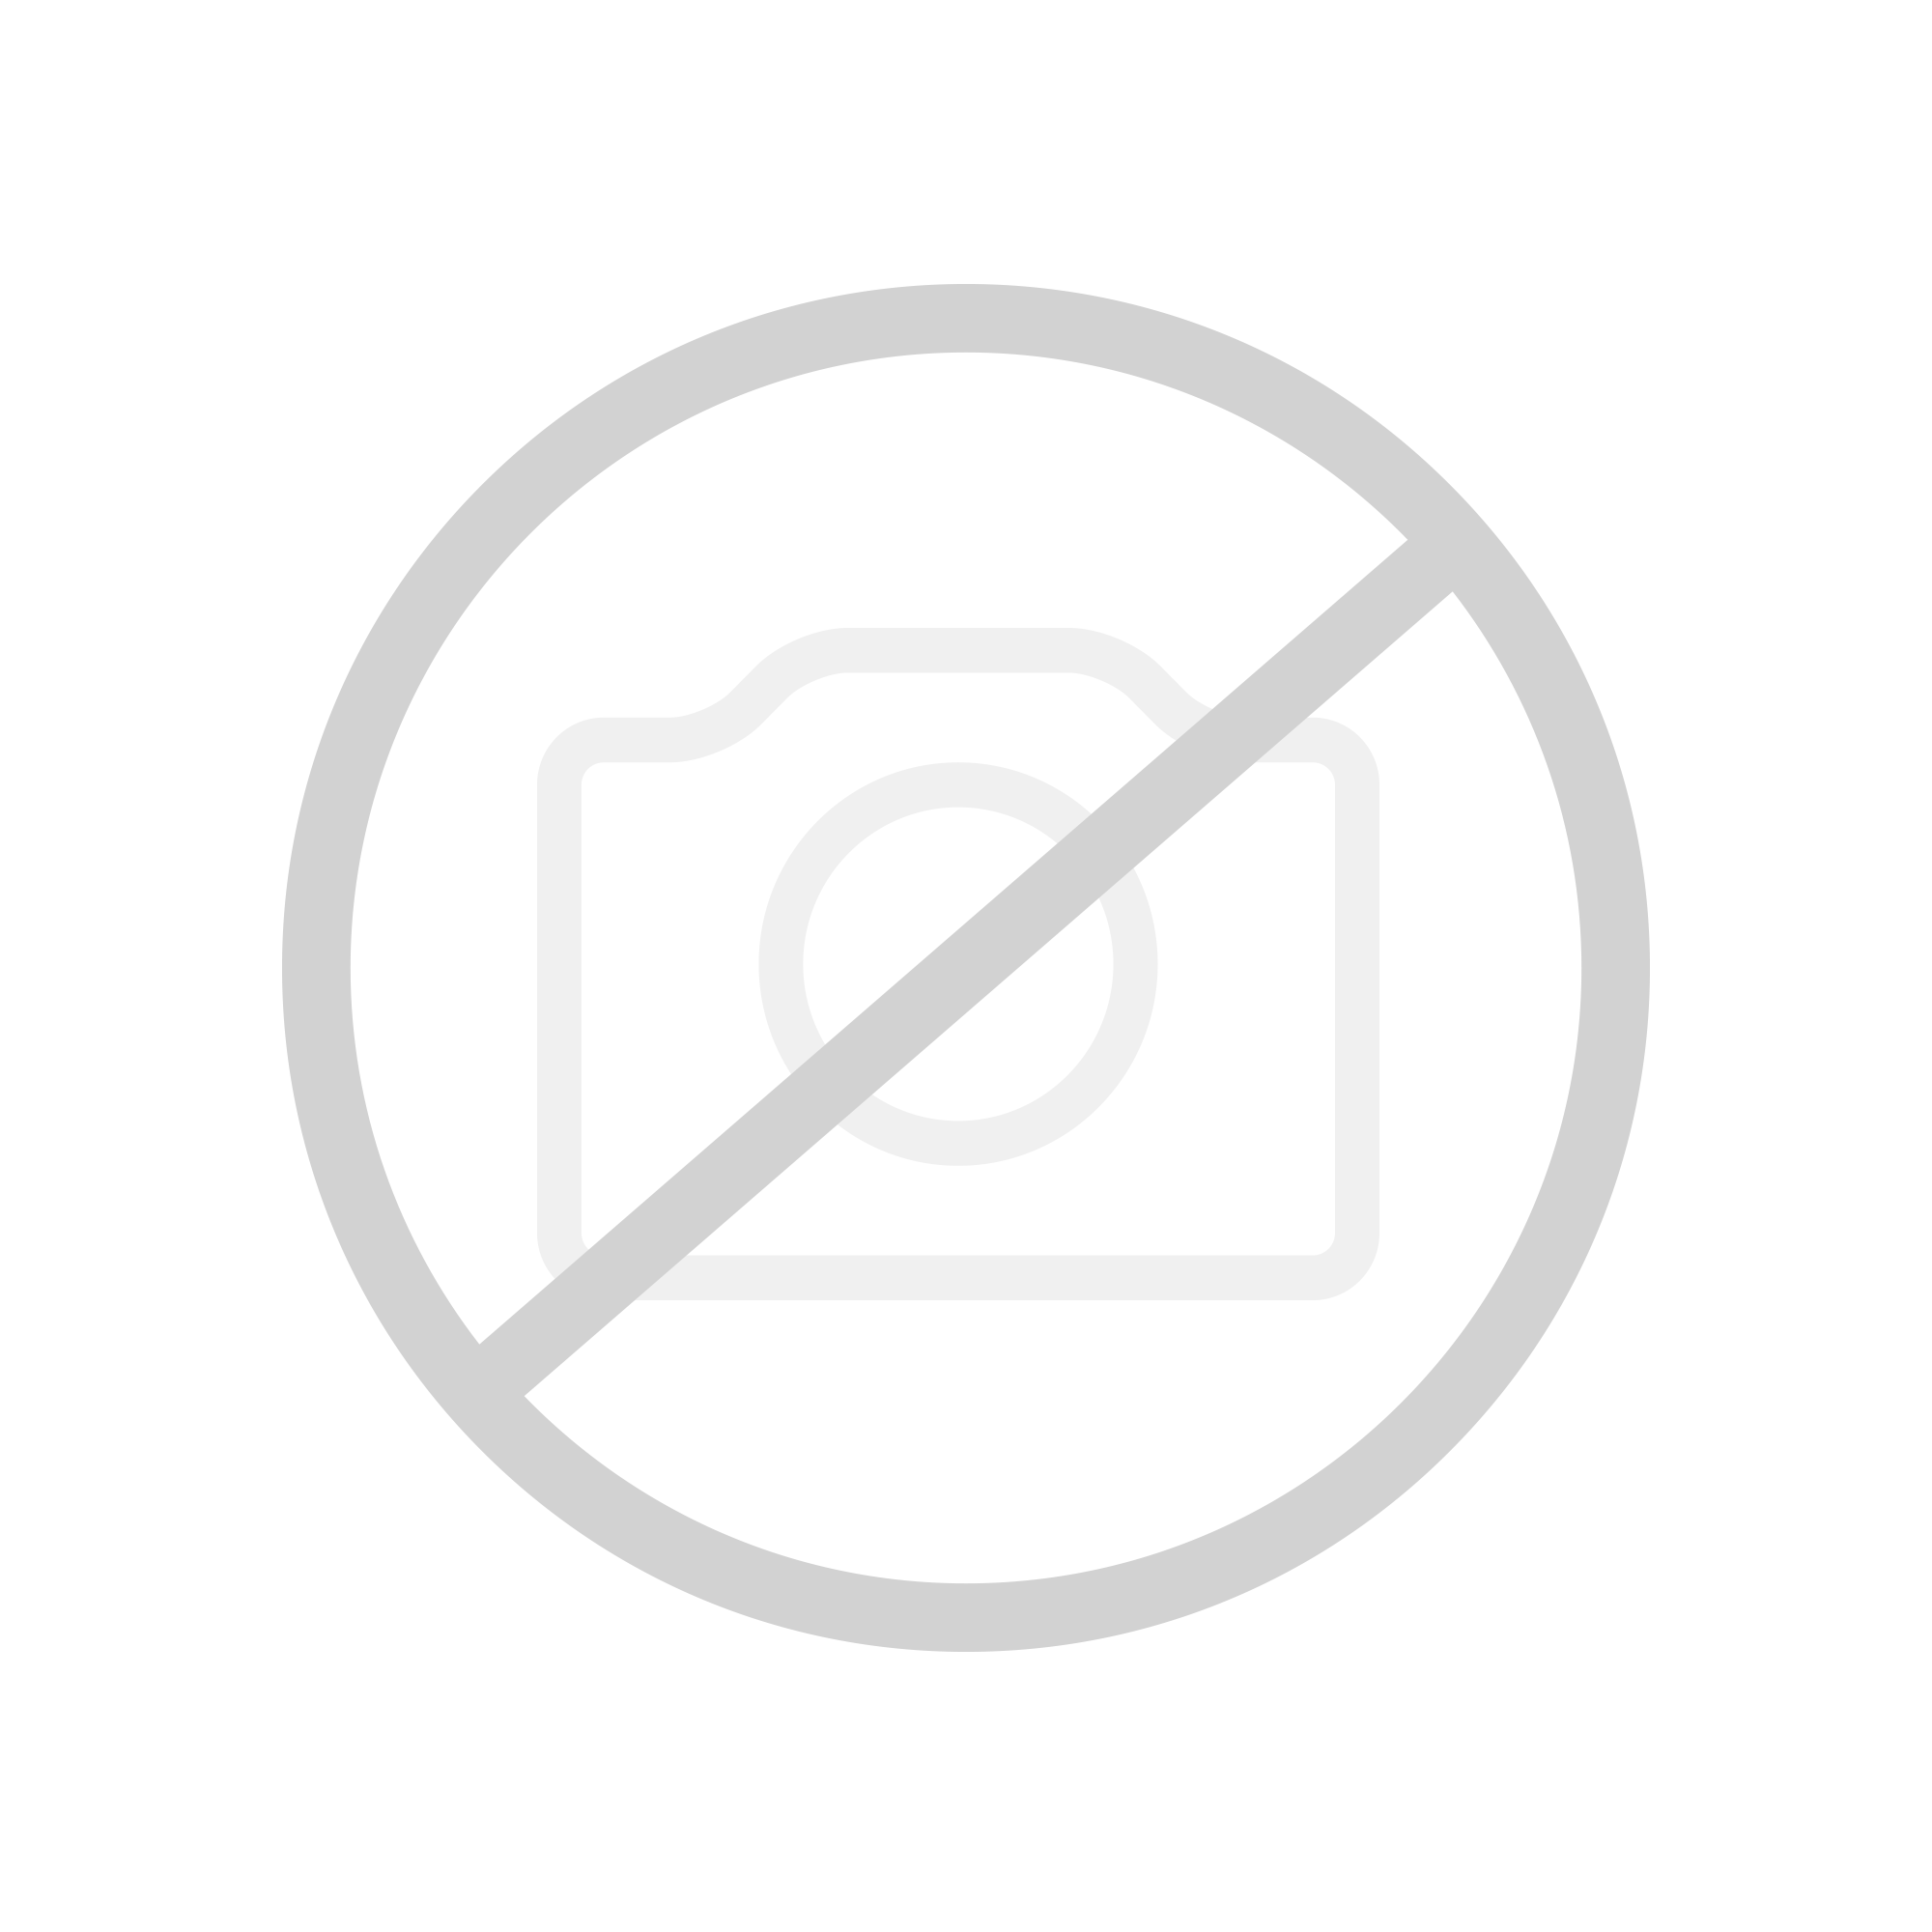 hansgrohe raindance select 150 unica 39 s puro set 650 mm. Black Bedroom Furniture Sets. Home Design Ideas